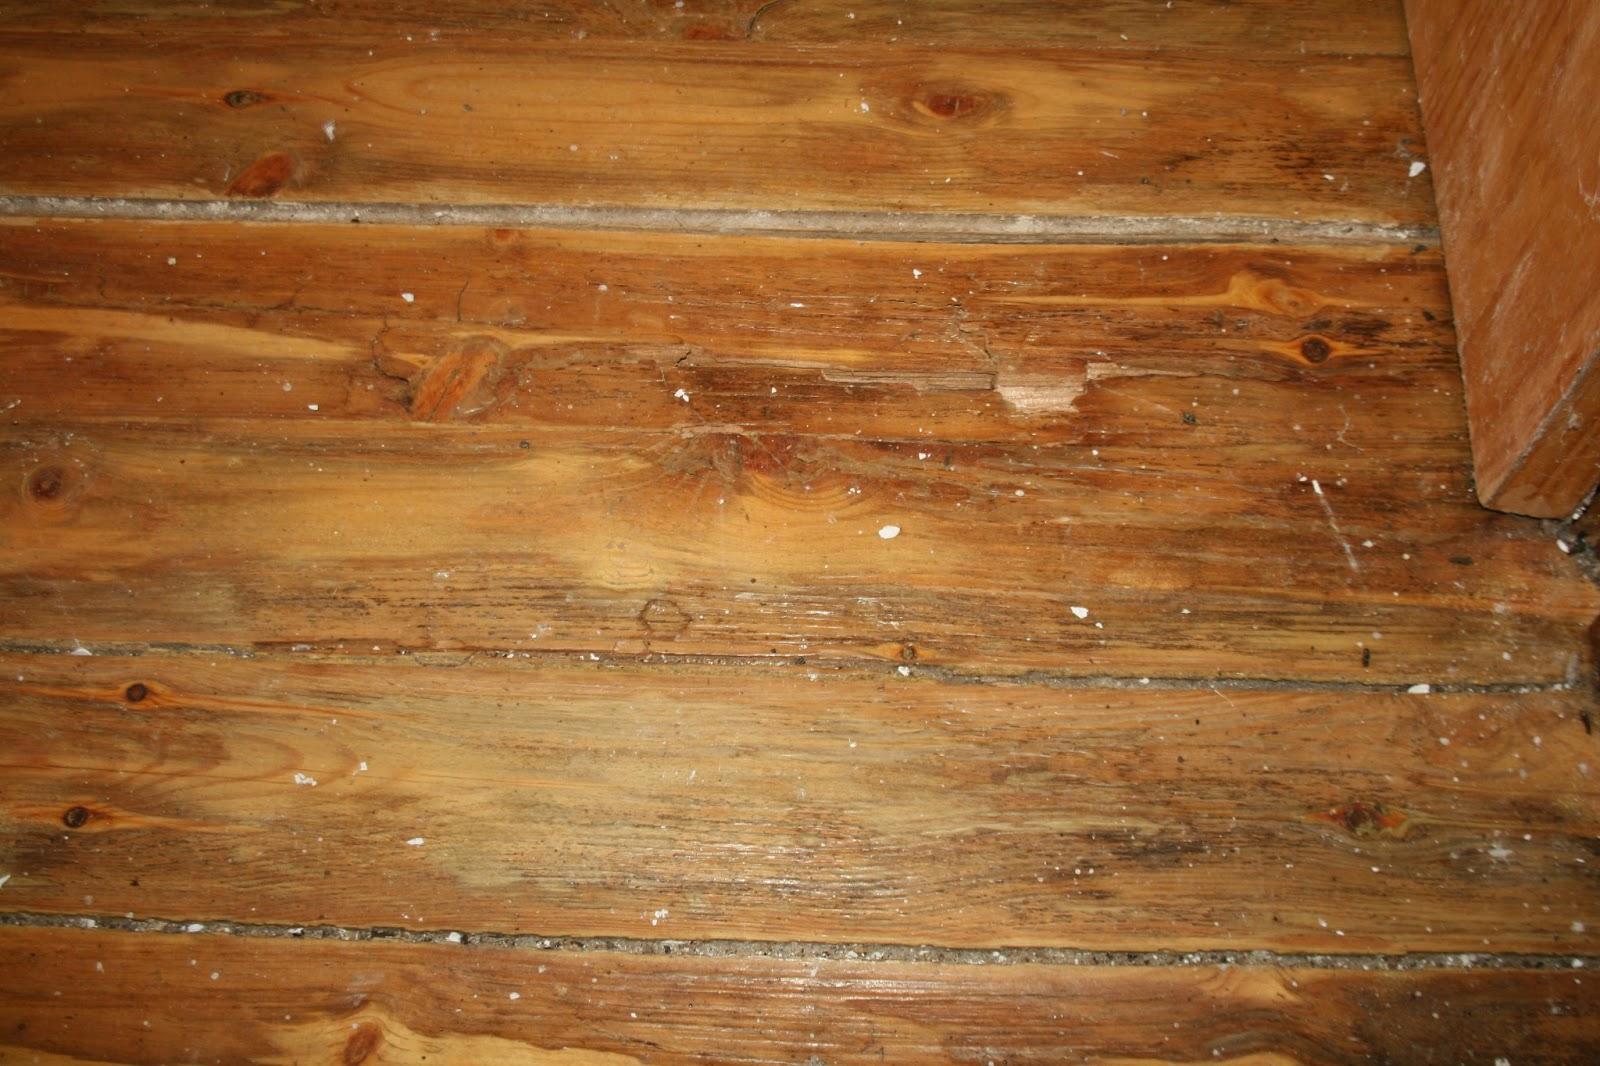 Peritararquitectura pudrici n de solado de madera - Madera machihembrada exterior ...